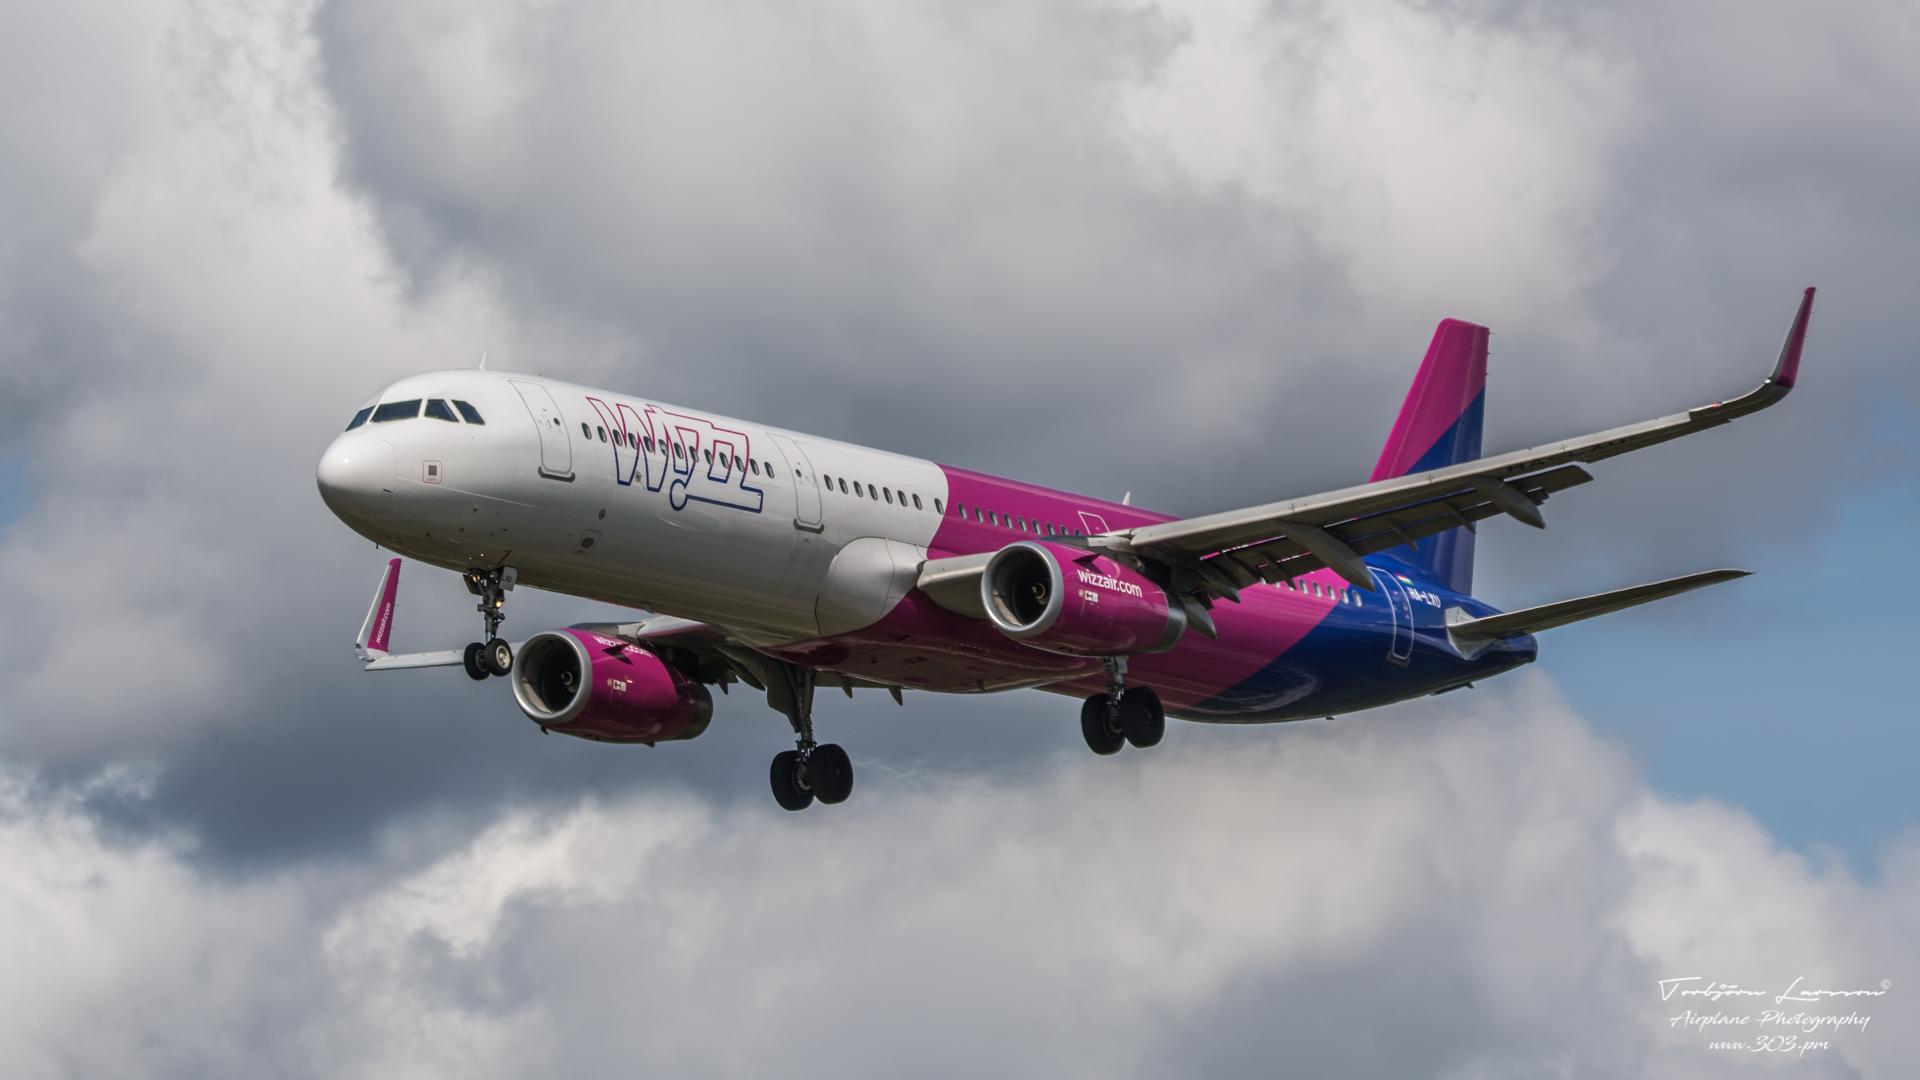 Airbus-A321-231SL-Wizz-Air-HA-LXU-TBE_8227